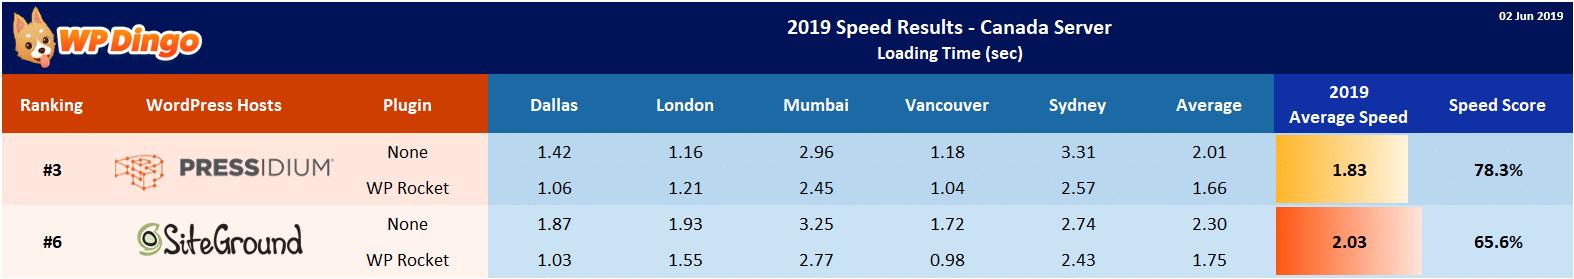 2019 Pressidium vs SiteGround Speed Table - Canada Server